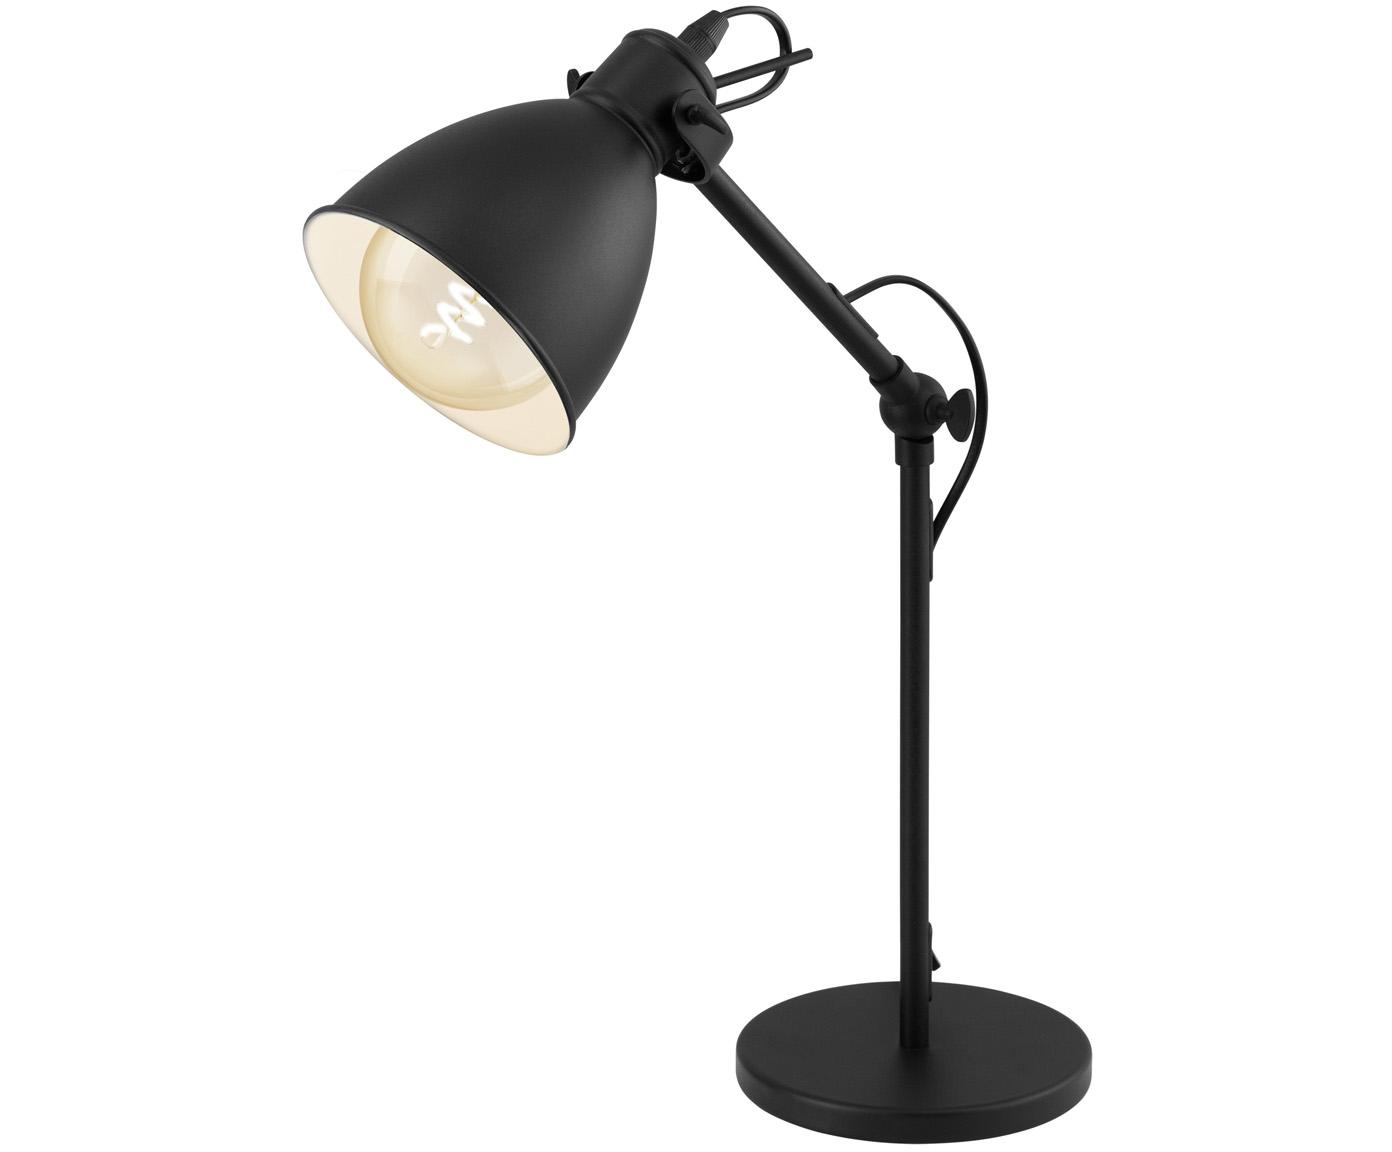 Lámpara de escritorio Ethan, Pantalla: metal con pintura en polv, Cable: plástico, Negro, ∅ 15 x Al 43 cm